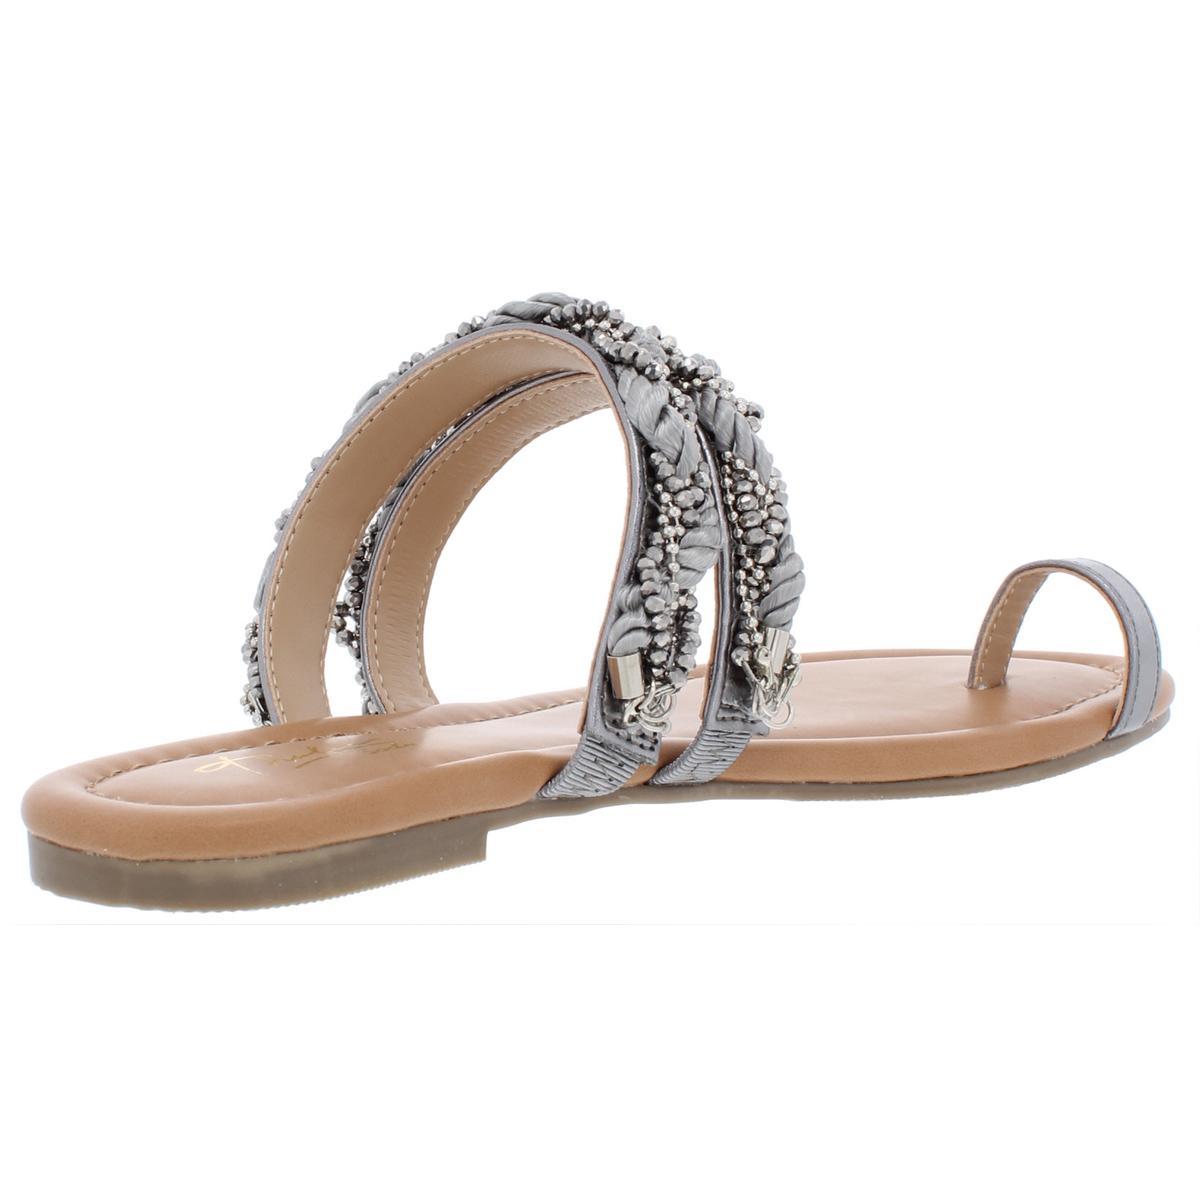 Thalia-Sodi-Womens-Jaelah-Toe-Ring-Microsuede-Dress-Flat-Sandals-Shoes-BHFO-7192 thumbnail 6